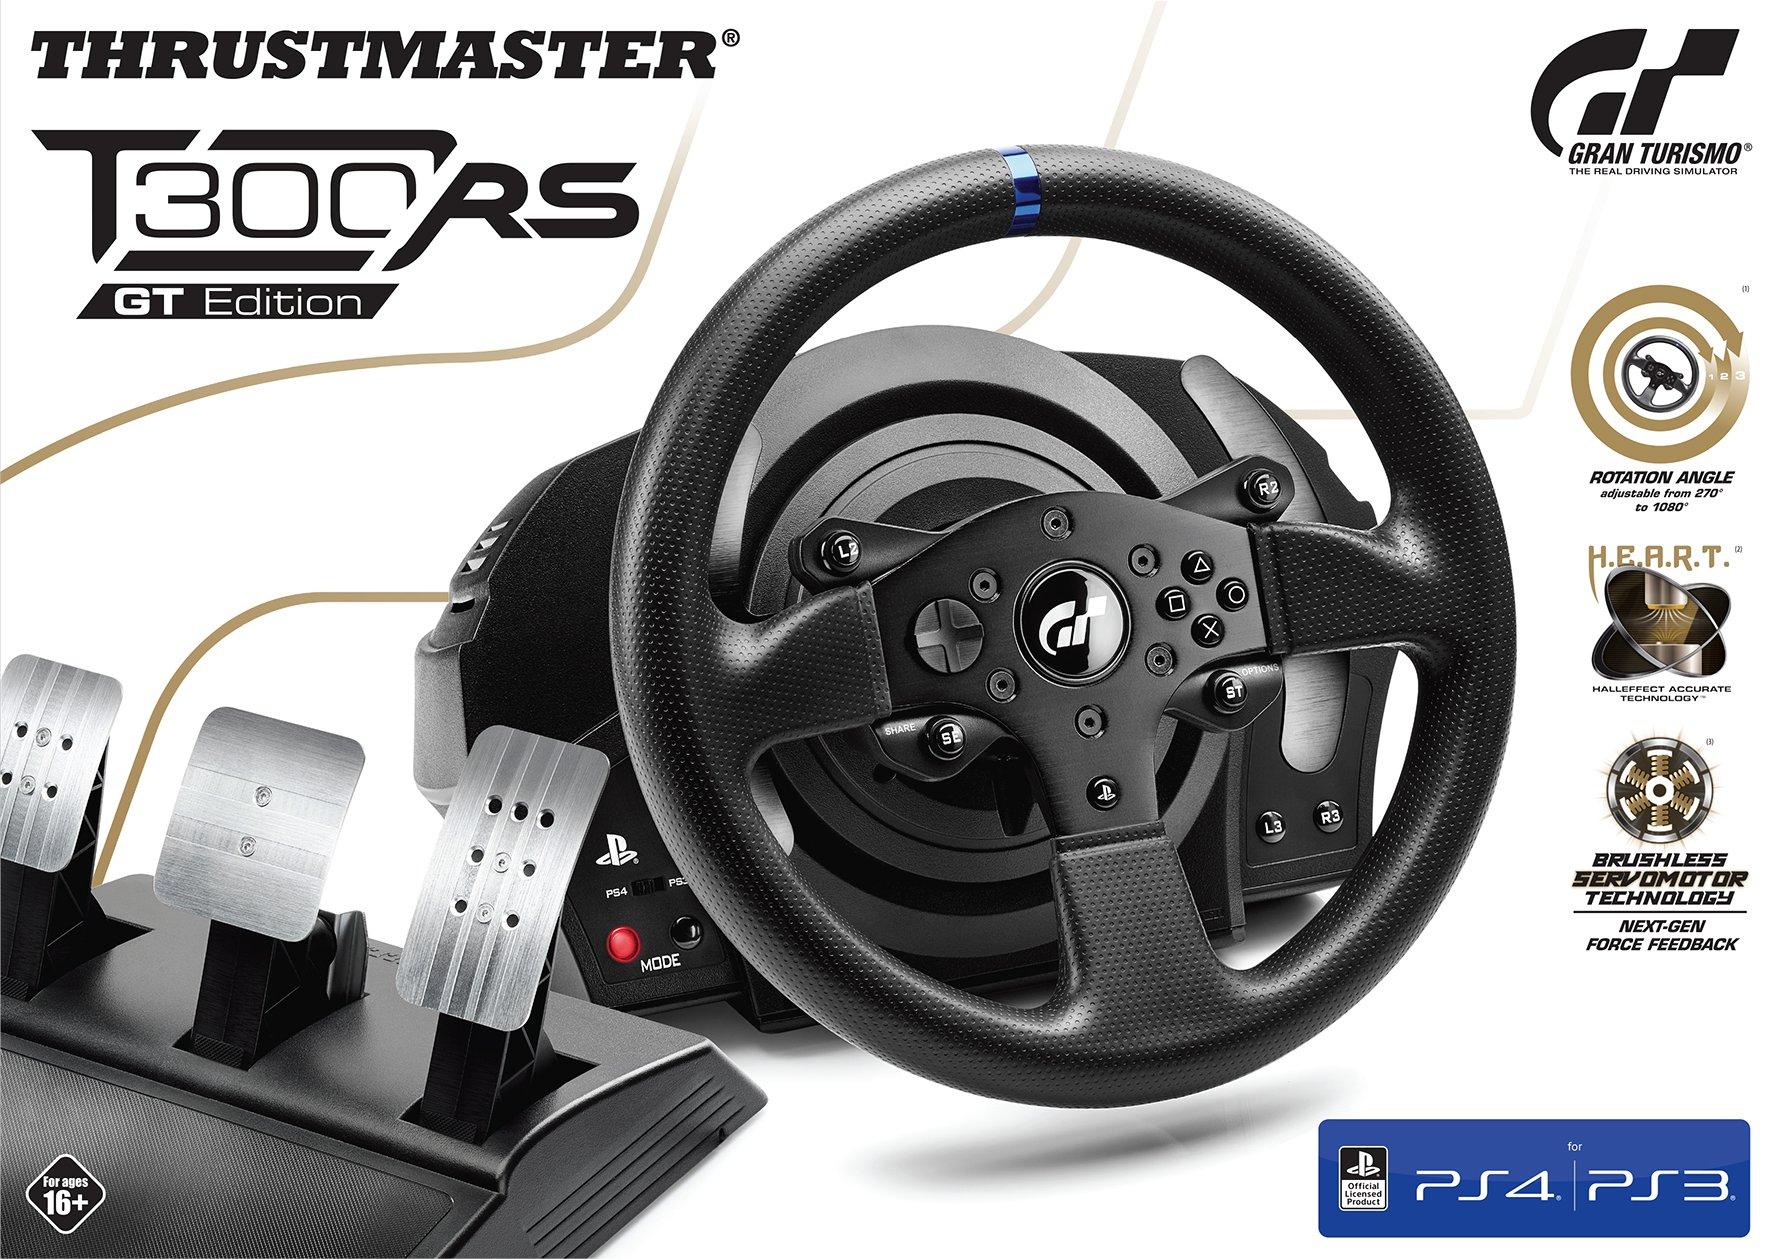 [amazon.fr] Thrustmaster T300 RS GT Edition - Lenkrad und 3er-Pedal-Set ( für PC, PS3, PS4) // 259€ statt 309€